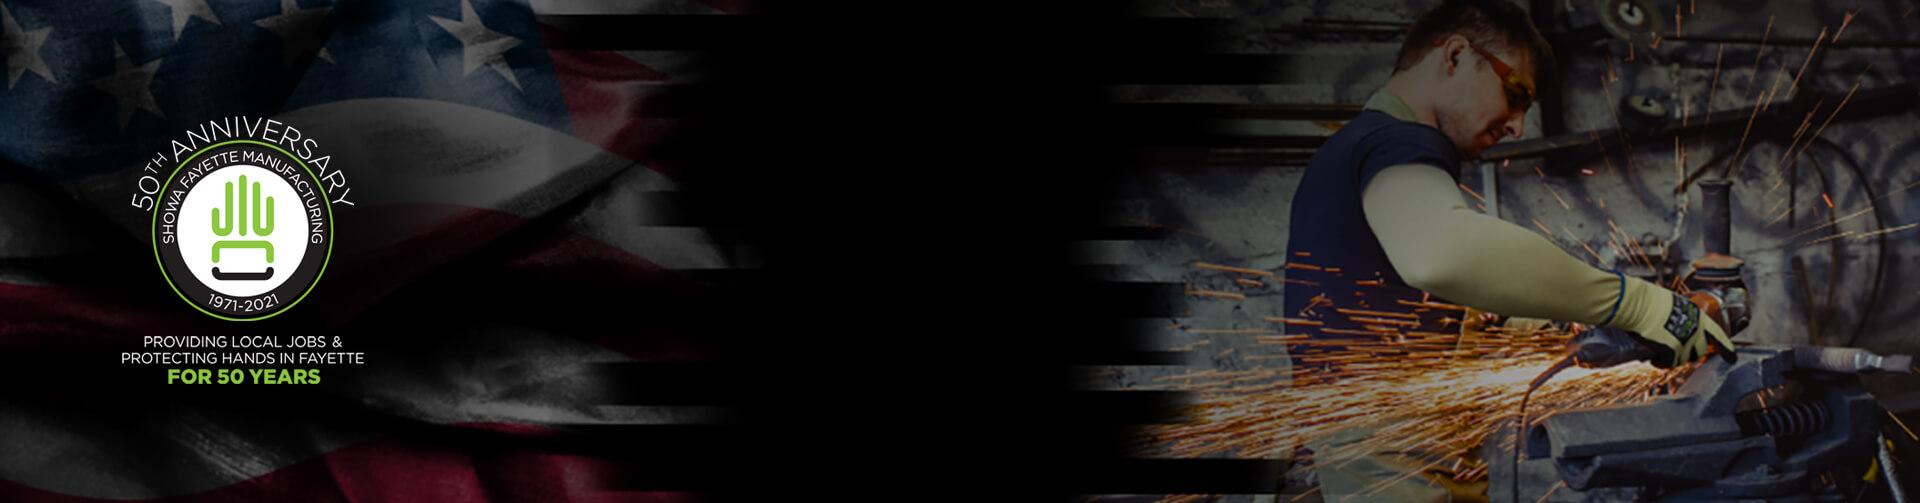 UPDATED-Fayette-50th-anniv-1920x503px-web-banner-app-shot (00000002)